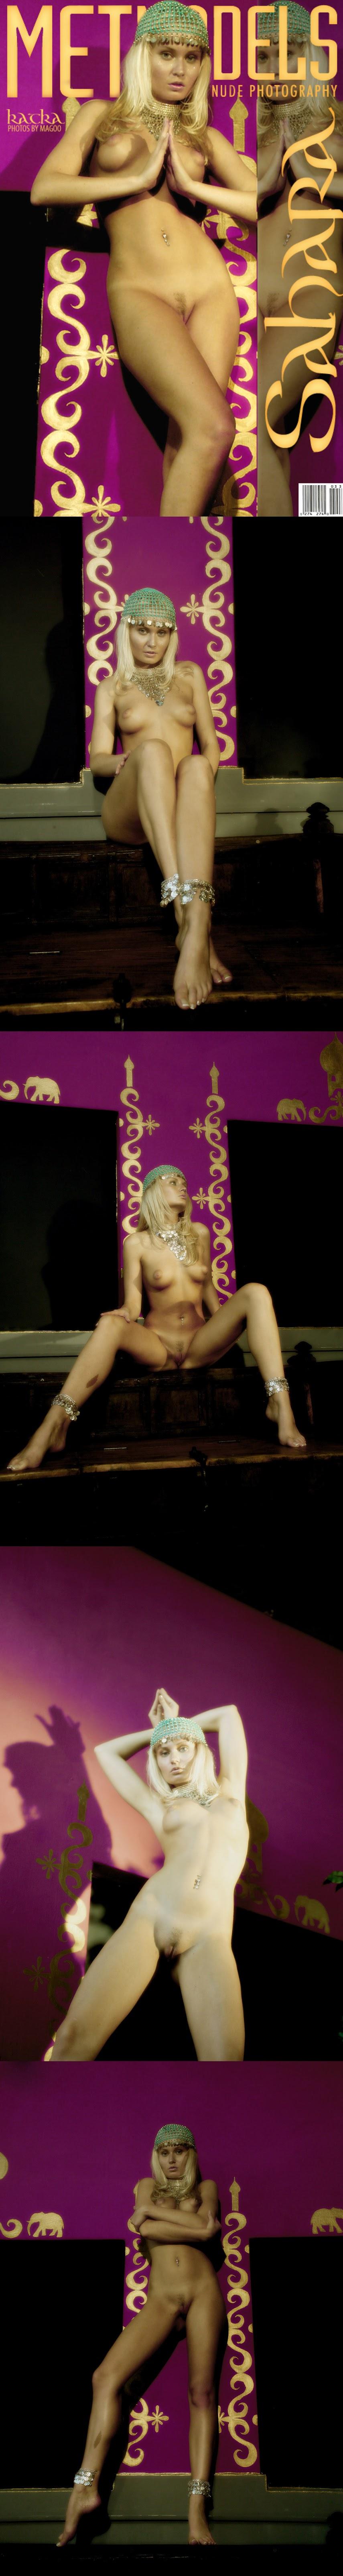 16 KAKRA SAHARA by Magoo sexy girls image jav